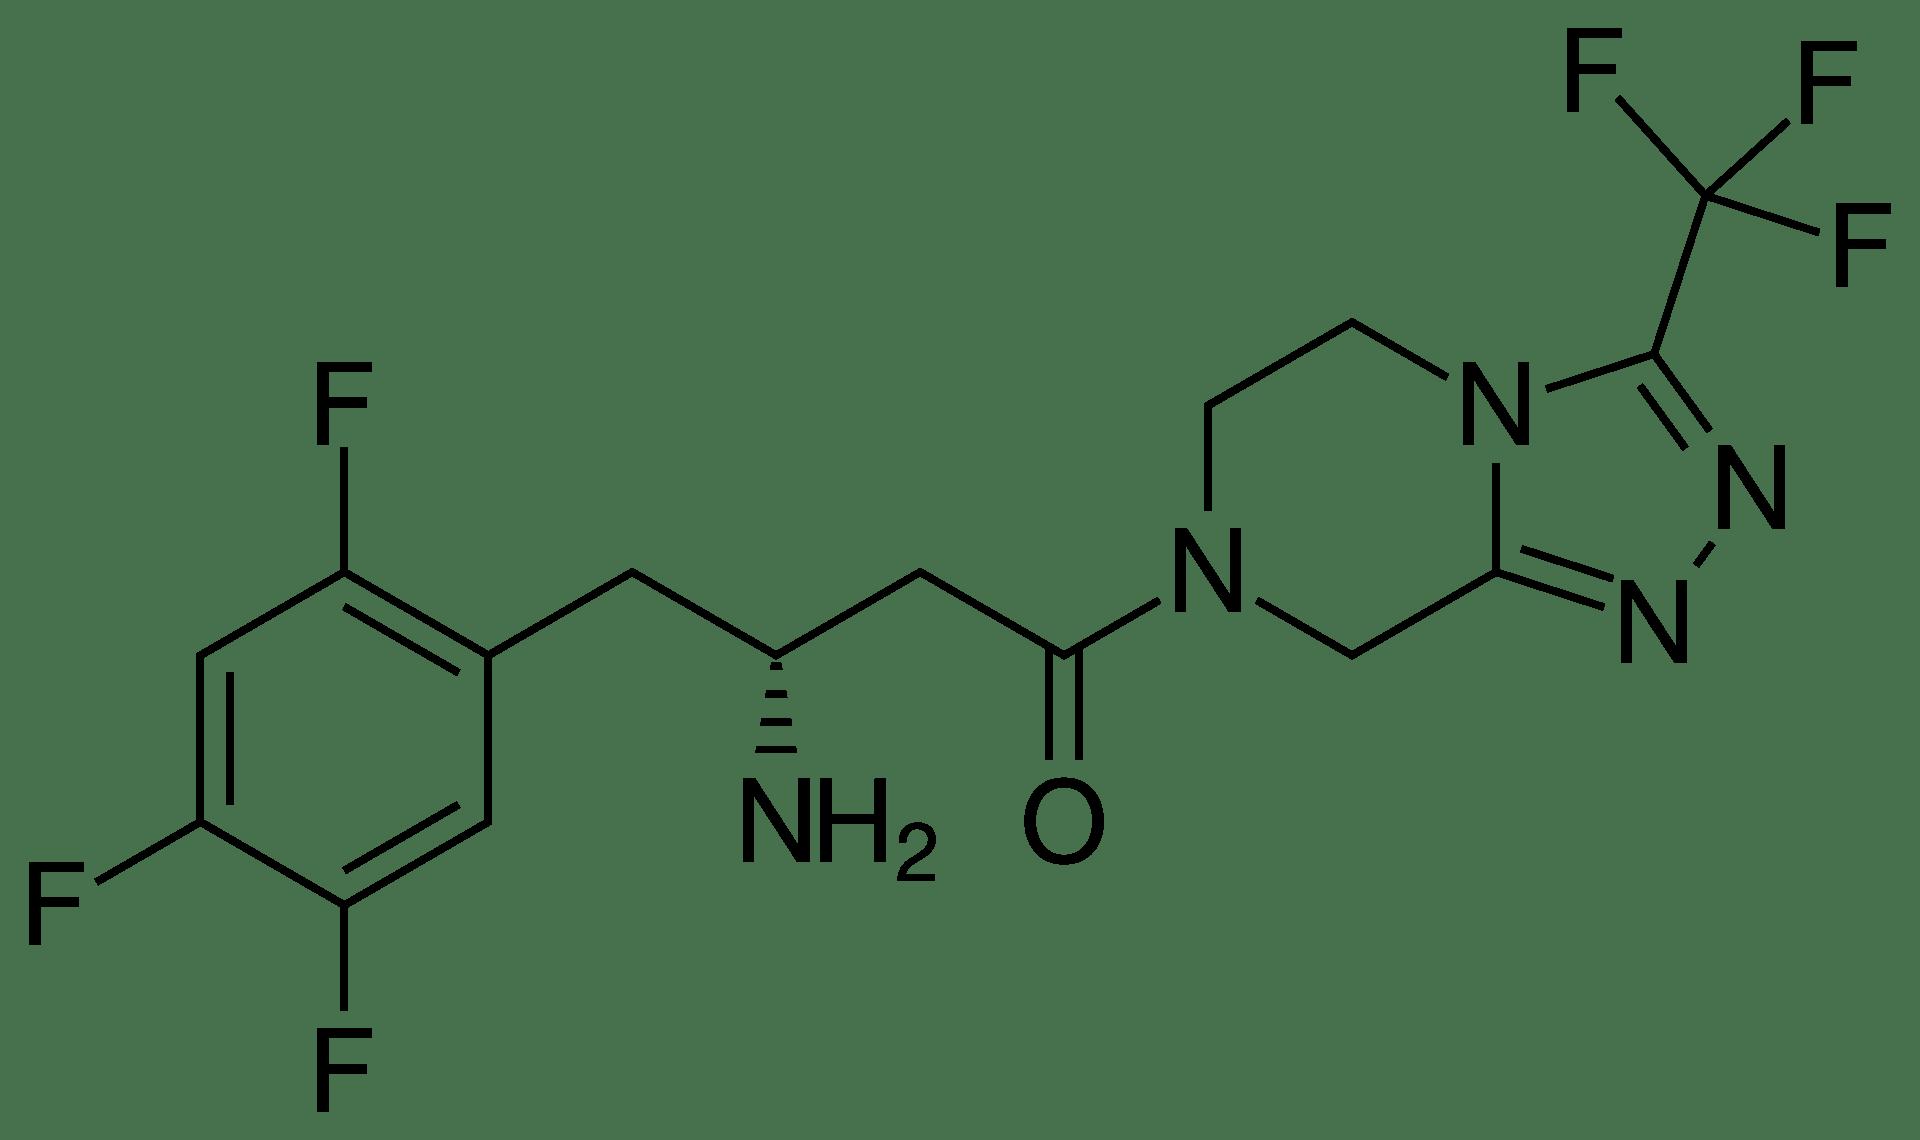 Прием глиптинов связали с уменьшением отложения бета-амилоида в мозге